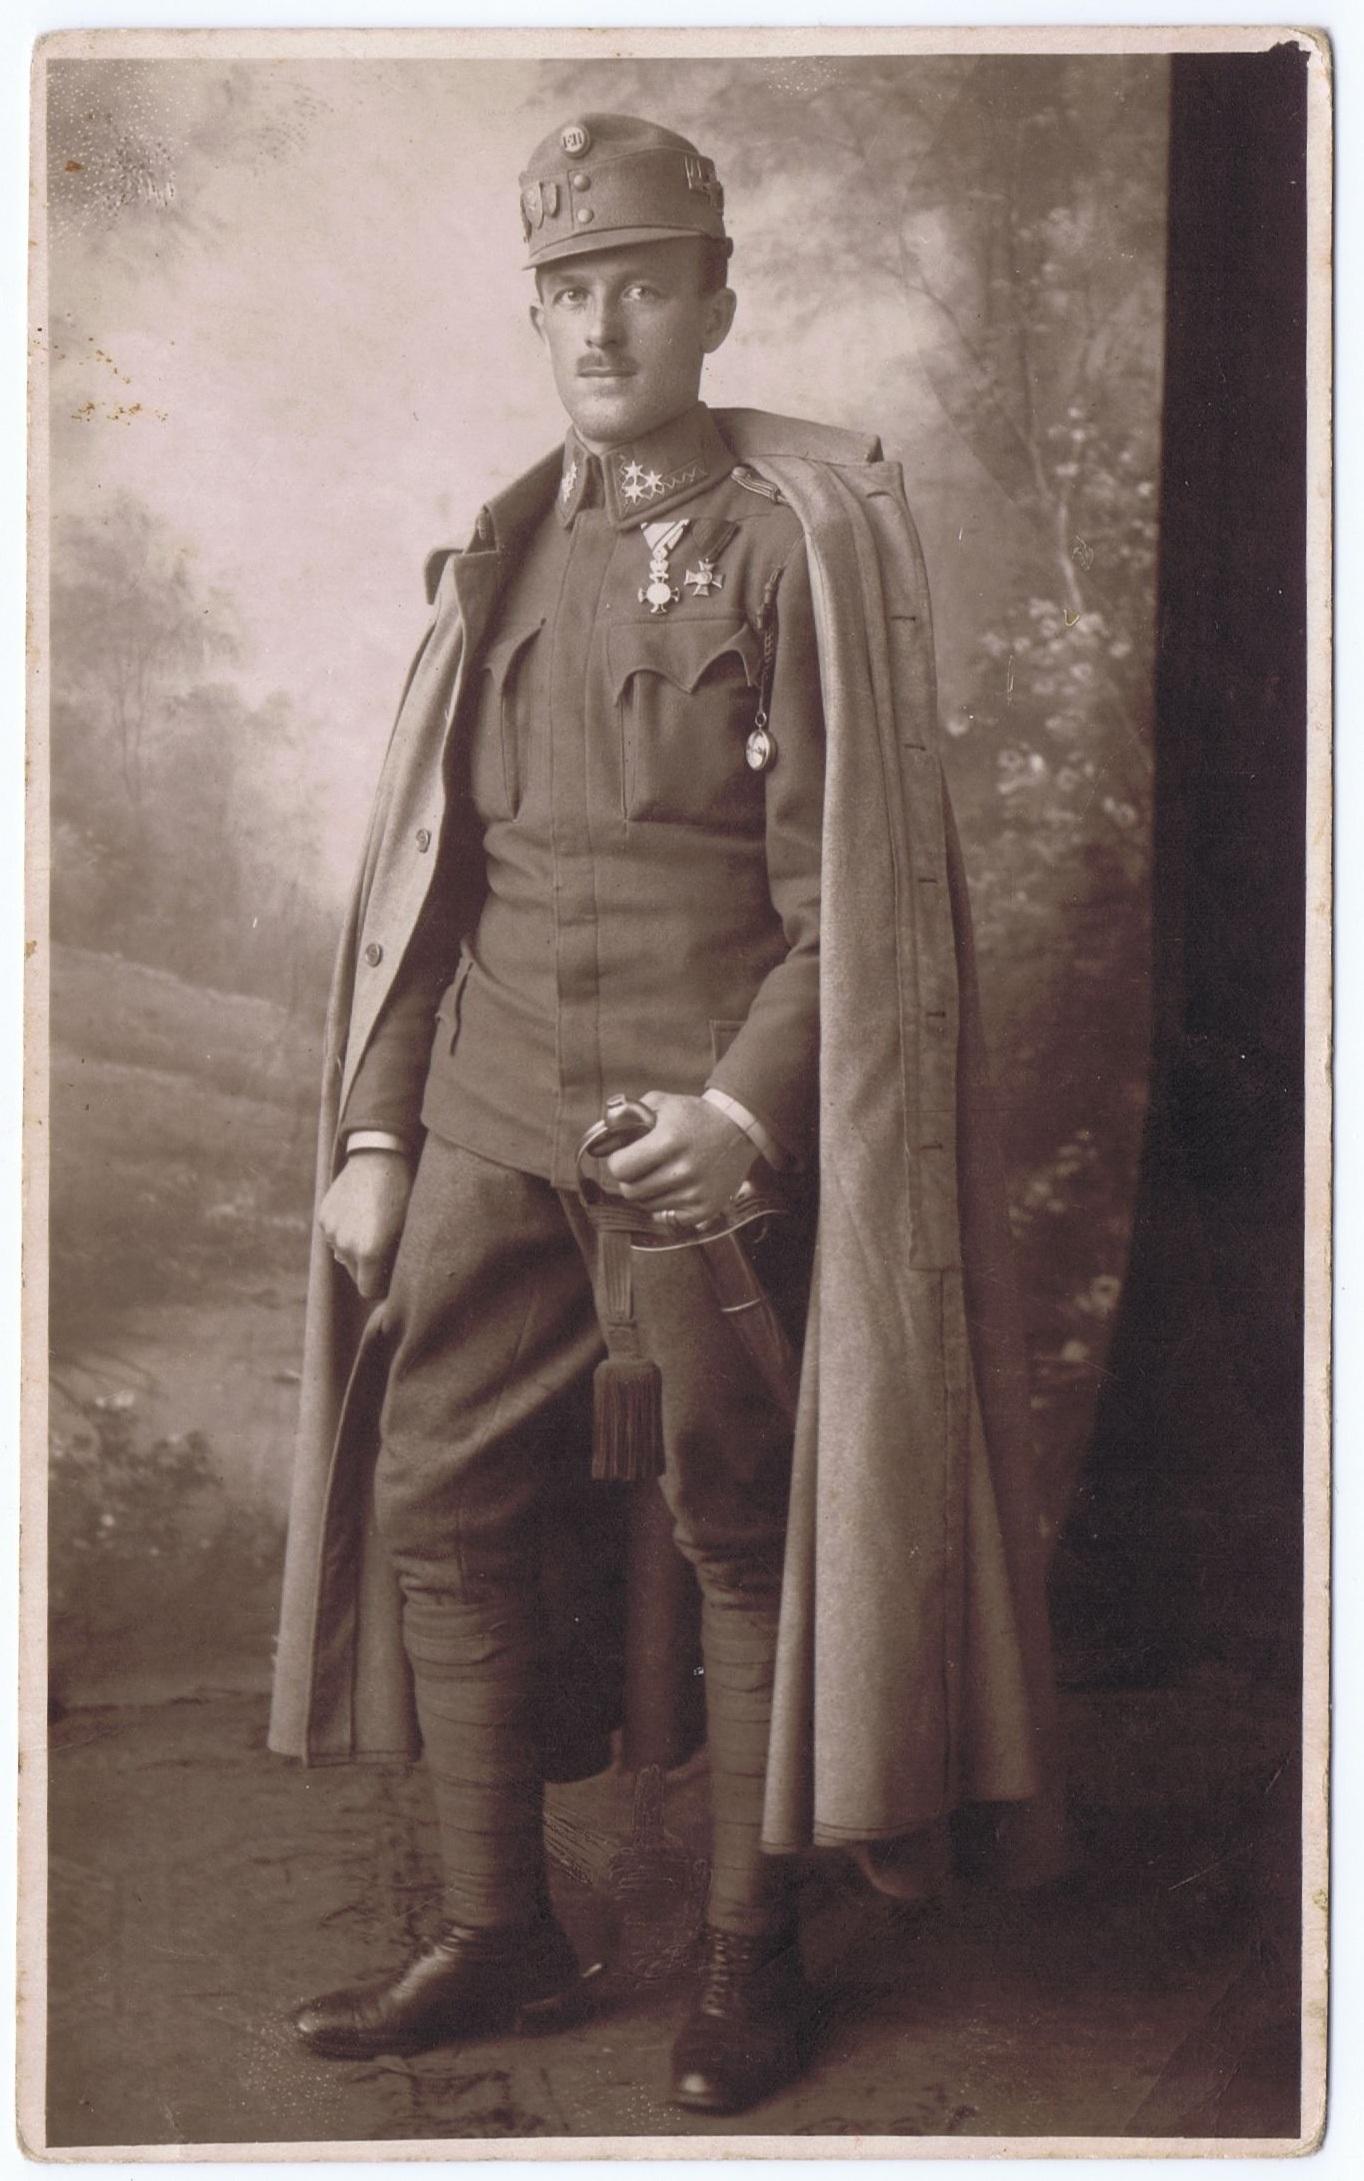 Gambar Potret Tentara Pakaian Lukisan Pria Sketsa